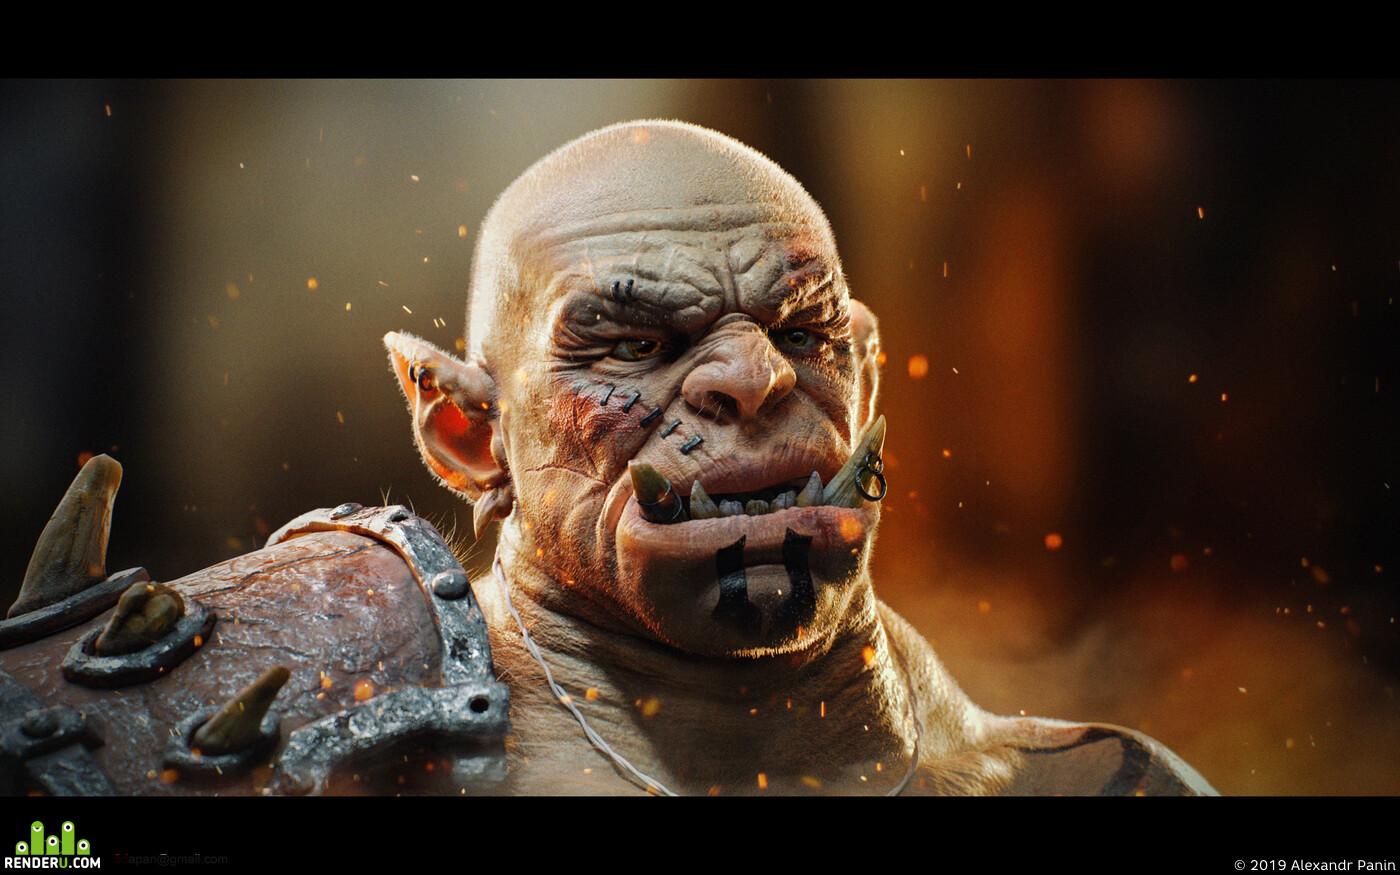 WorldOfWarcraft, creature, King-Warrior, beastman, 3d character